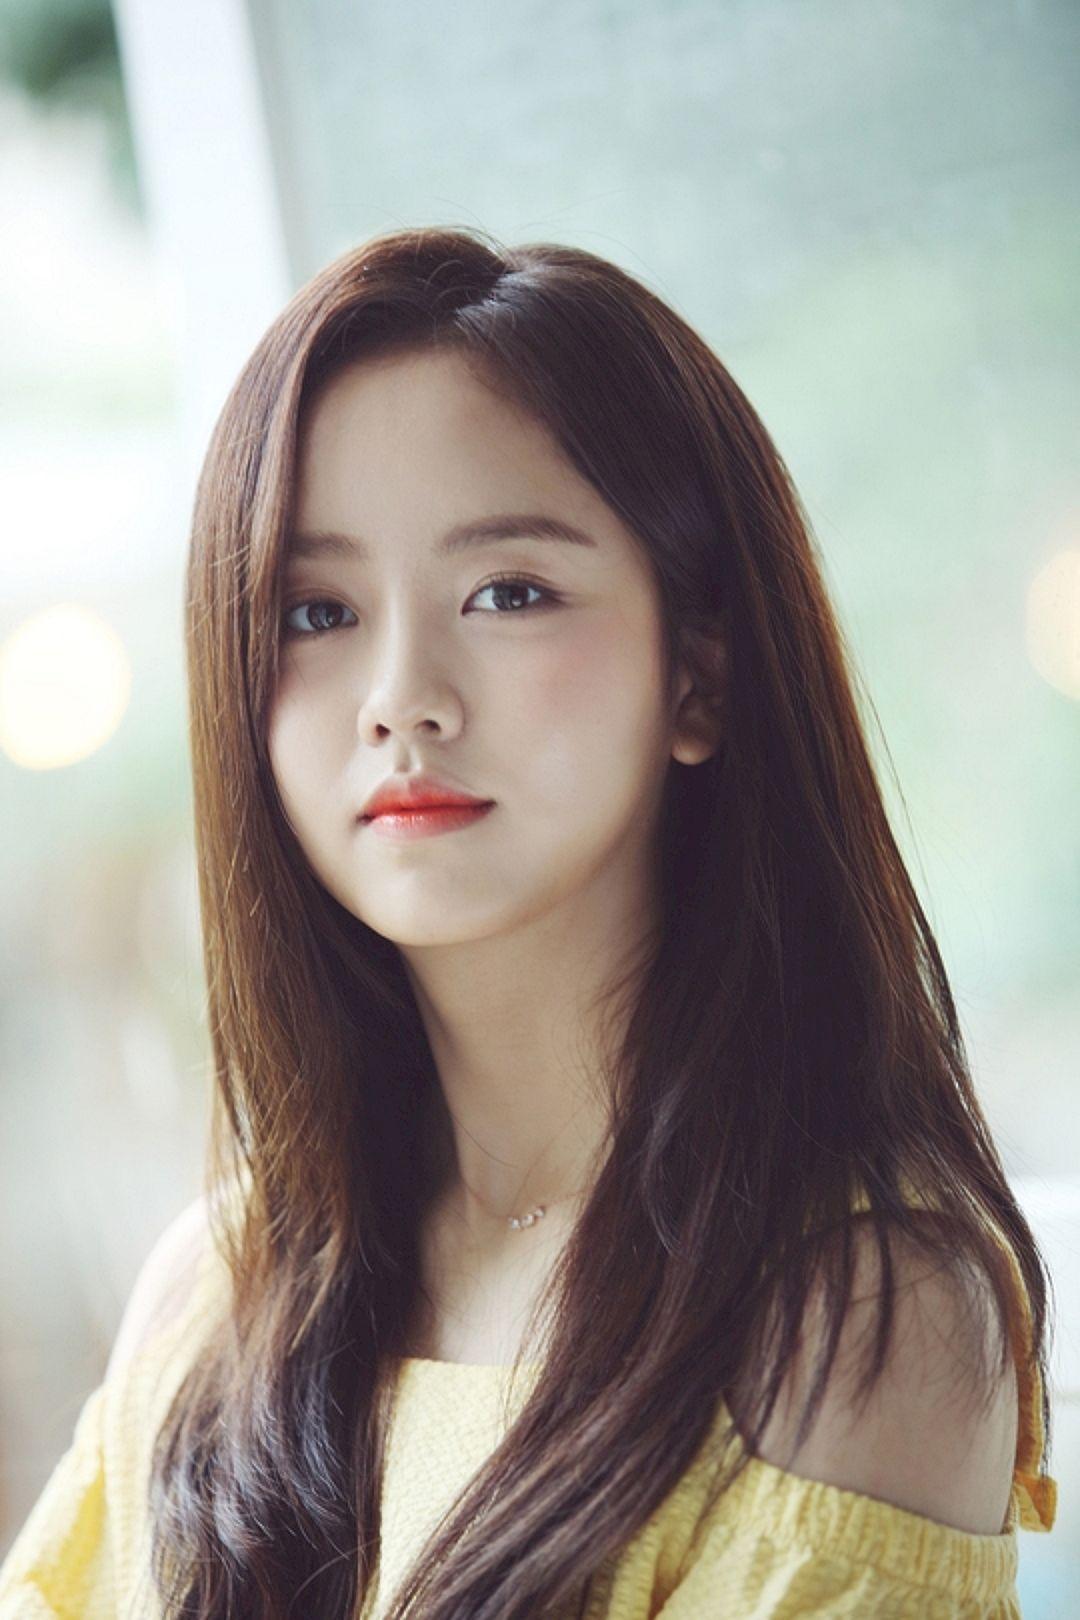 Download 5000 Wallpaper Cantik Korea  Gratis